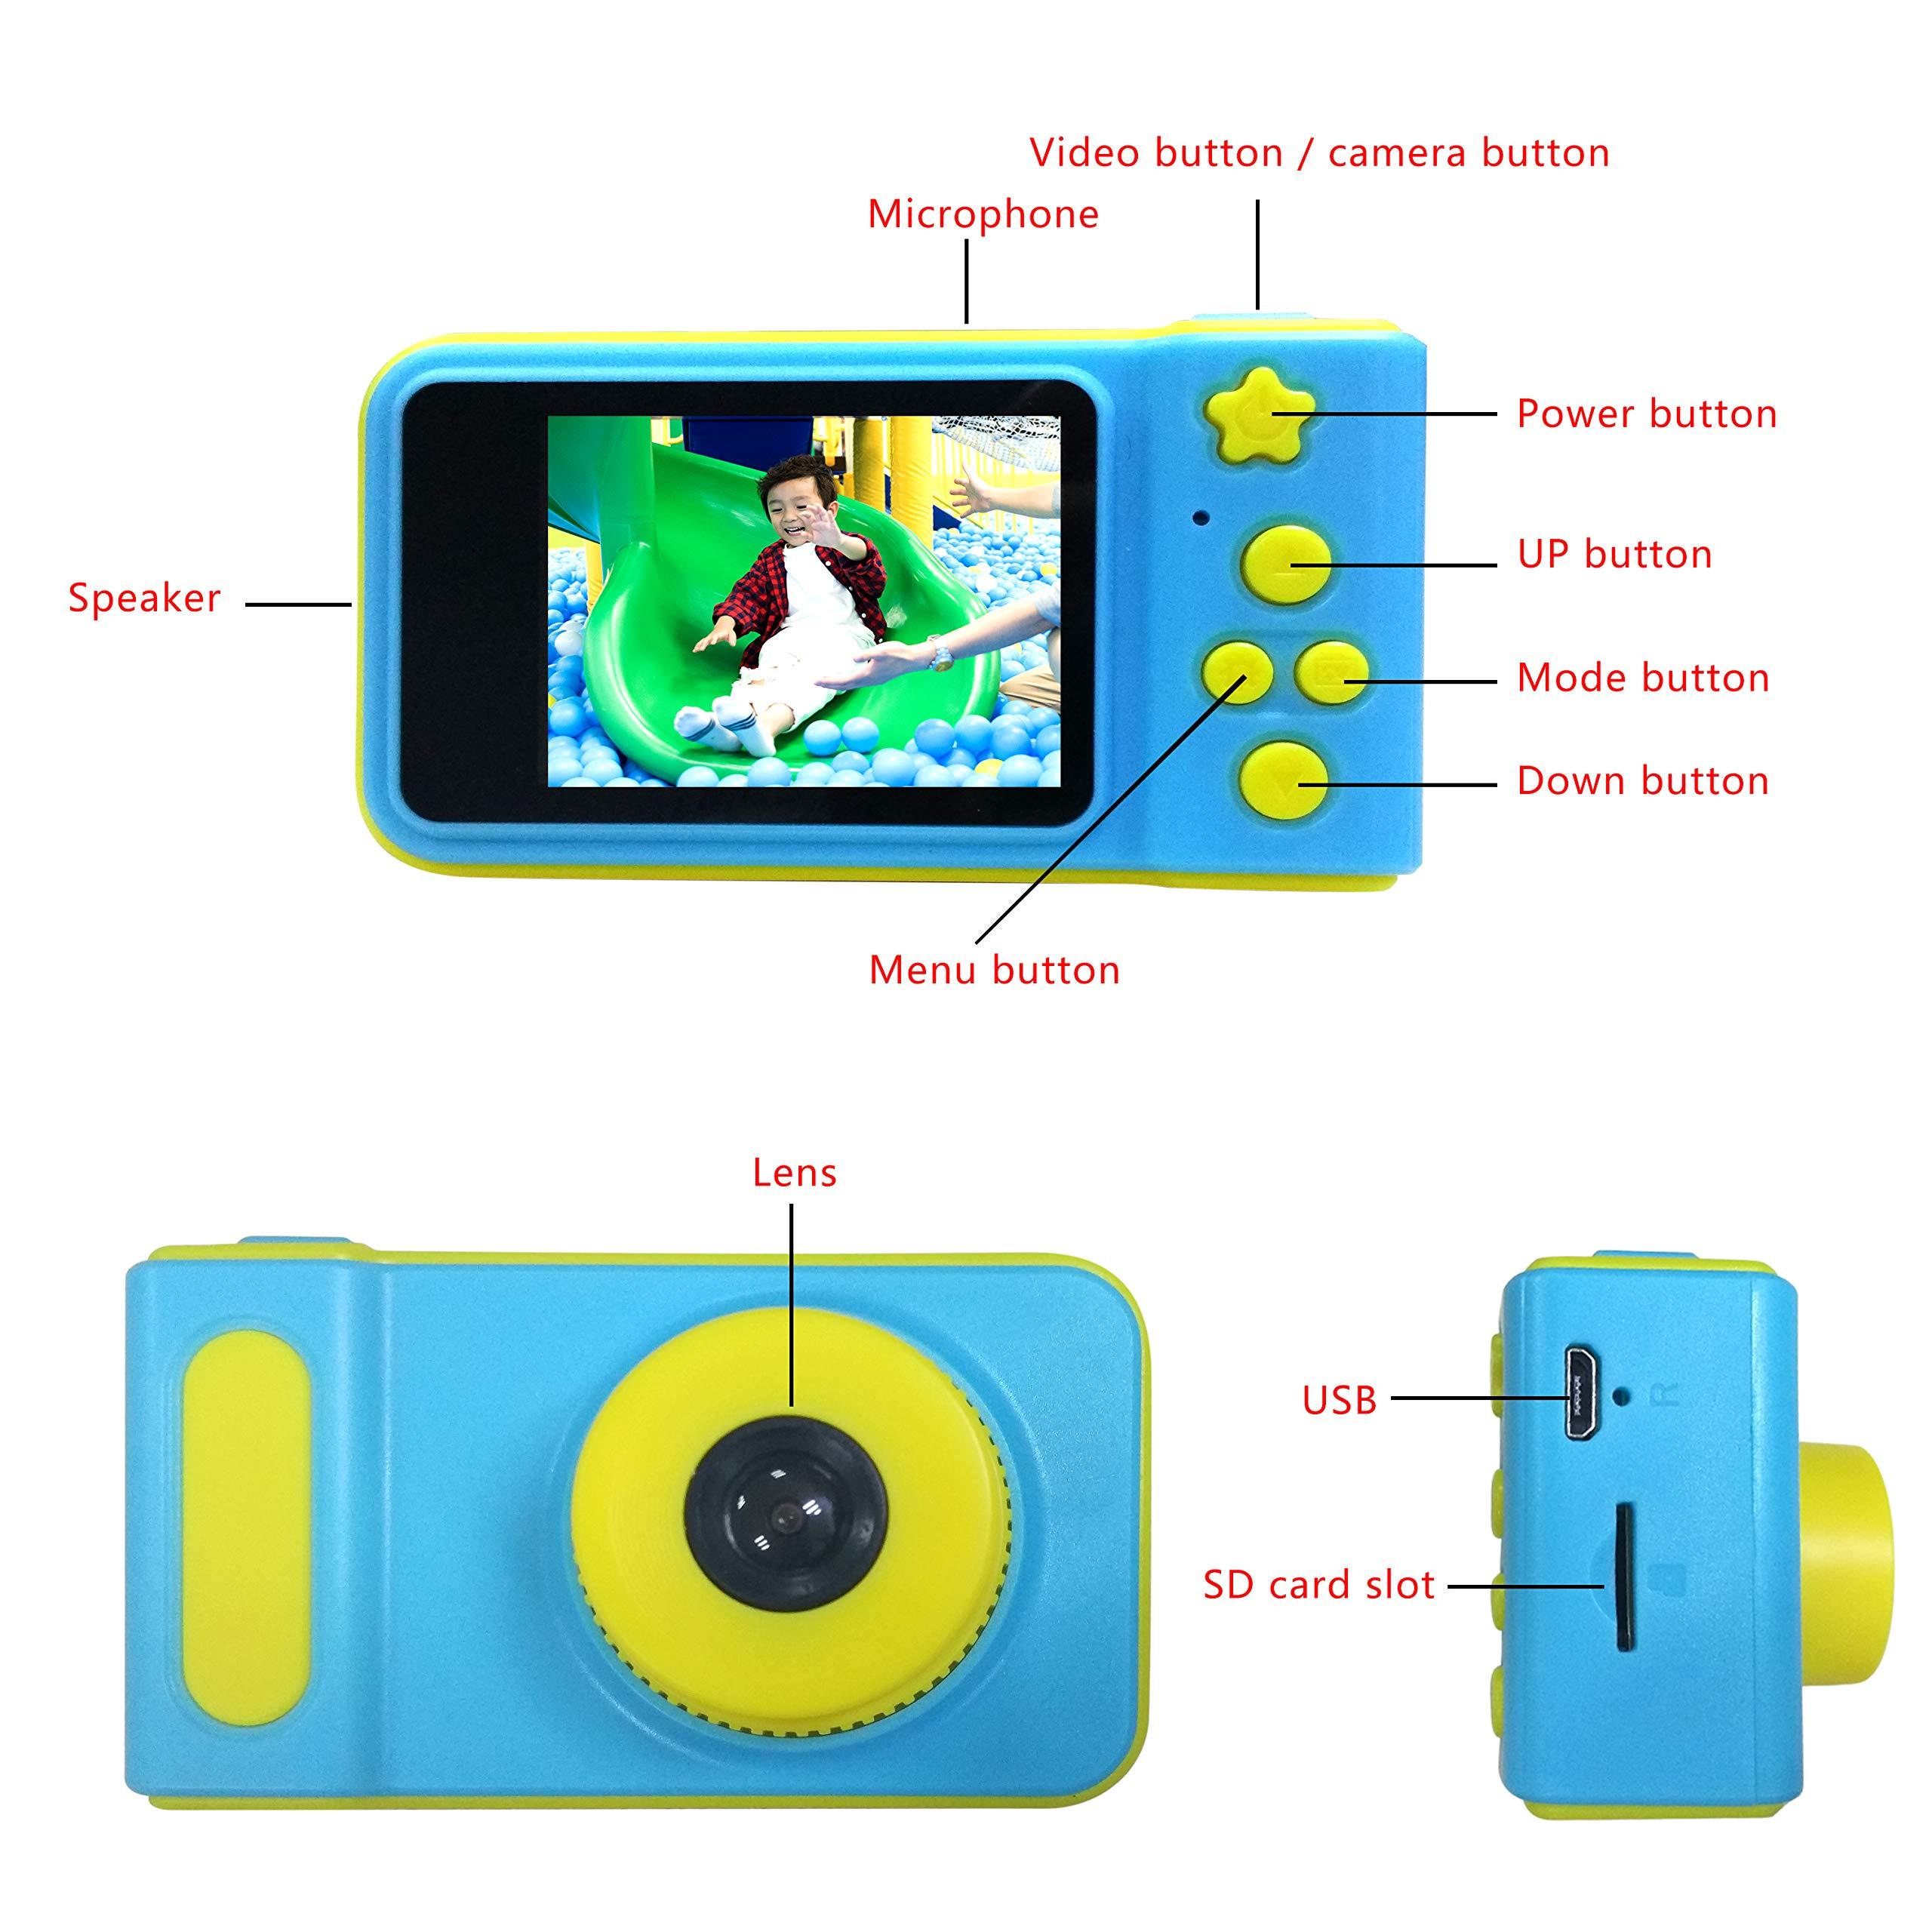 Kids Digital Camera Mini 2 Inch Screen Children Camera 1080 HD Digital Camera Free with 16G TF Card , Toys Camera for Boys Girls Birthday Gift- Blue by MJKJ (Image #6)